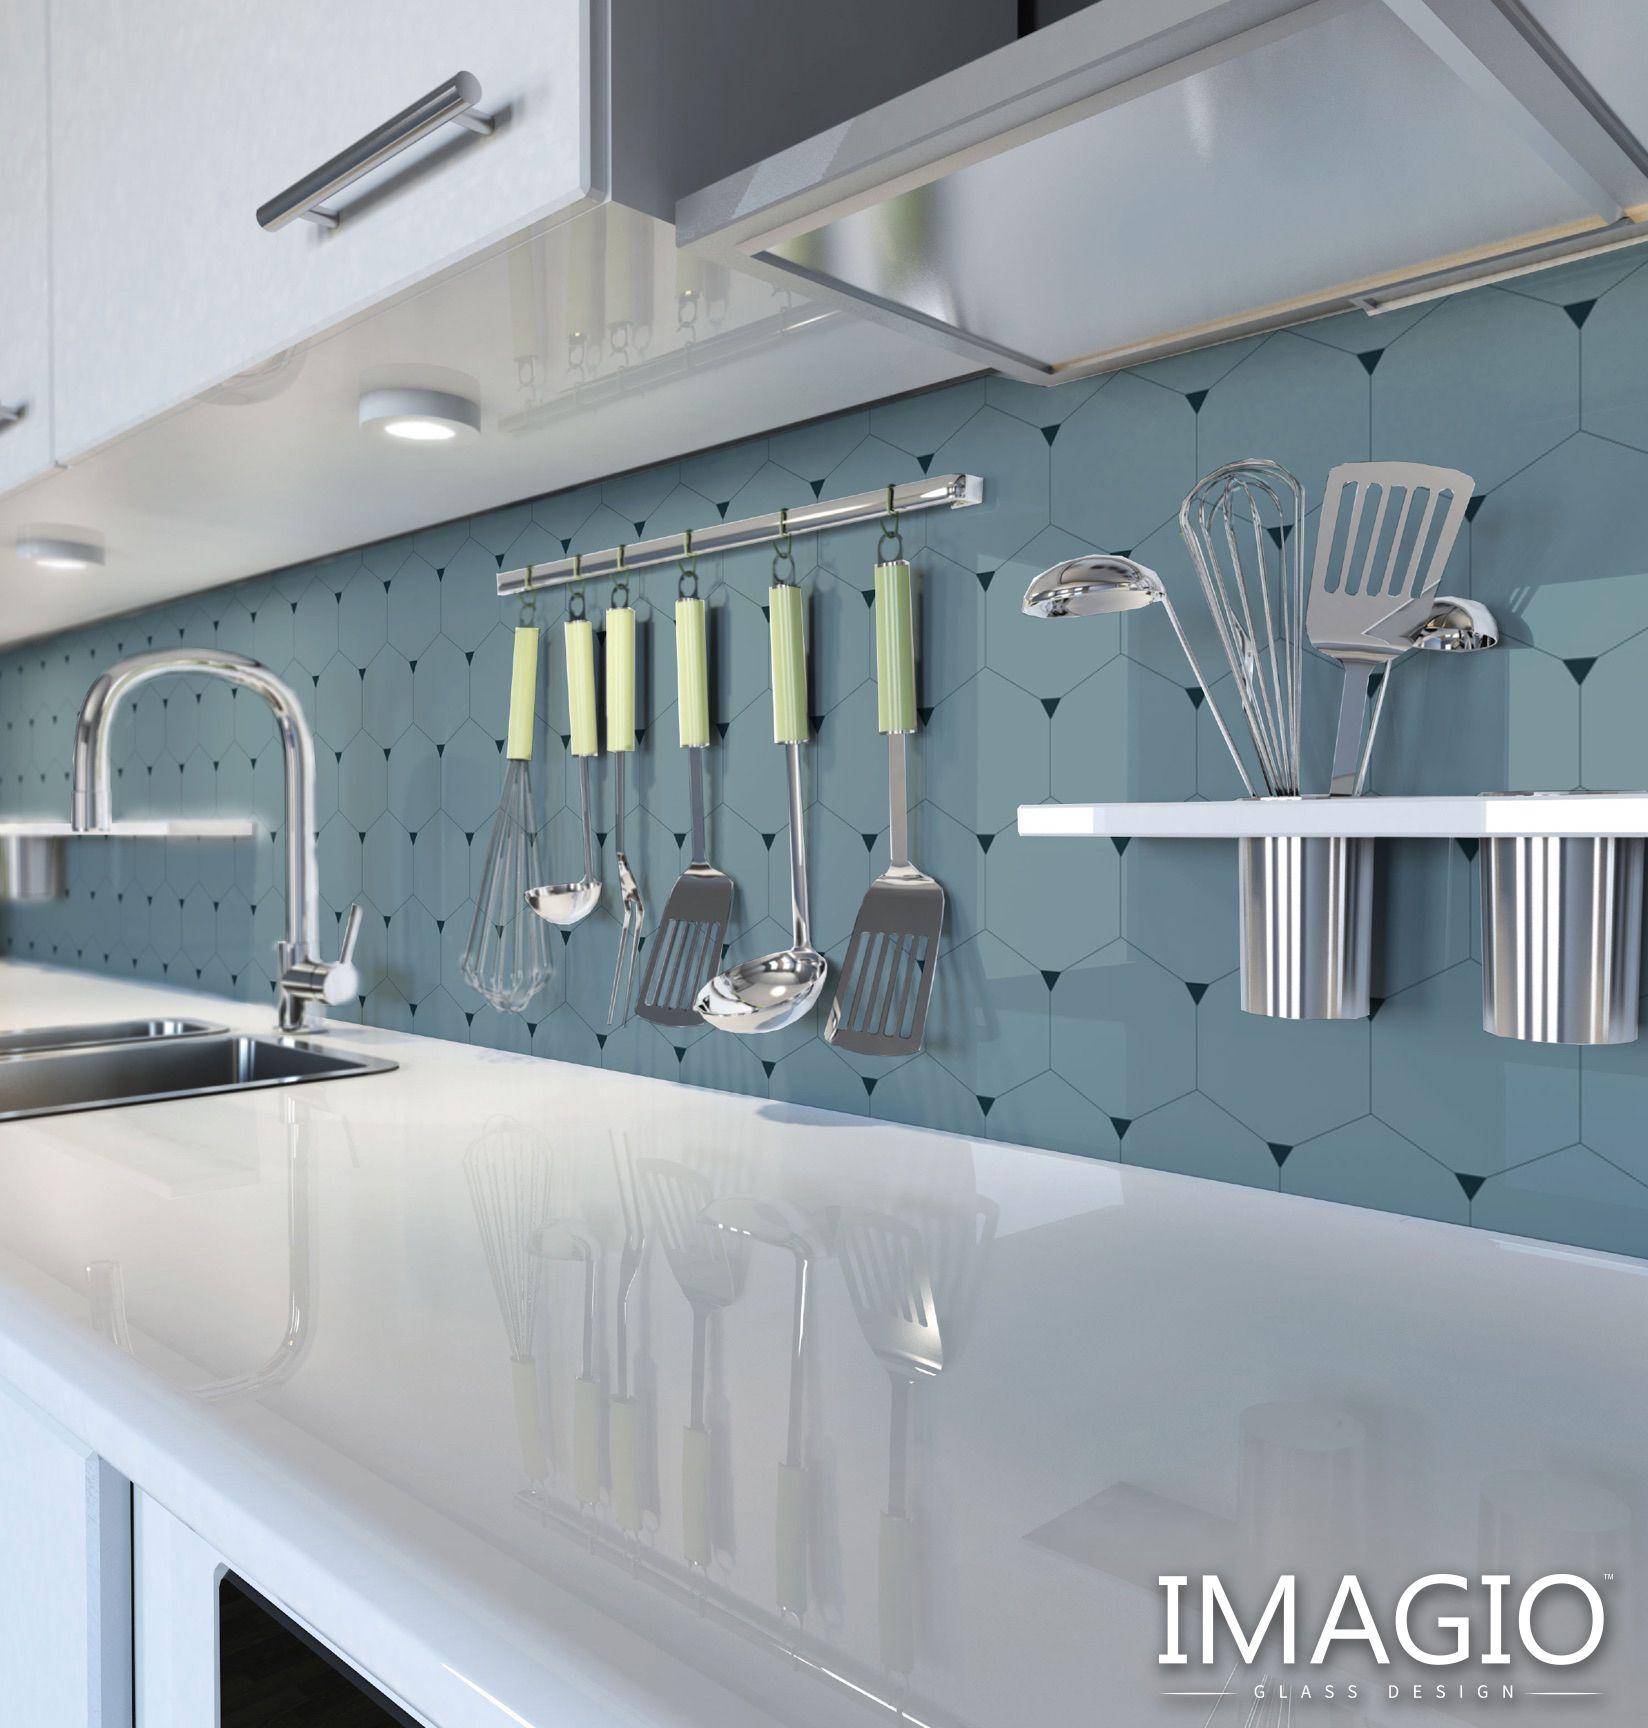 Imagio Glass Custom Glass Backsplashes Let Our Designers Help You 888 998 0010 Glass Backsplash Glass Splashback Glass Design